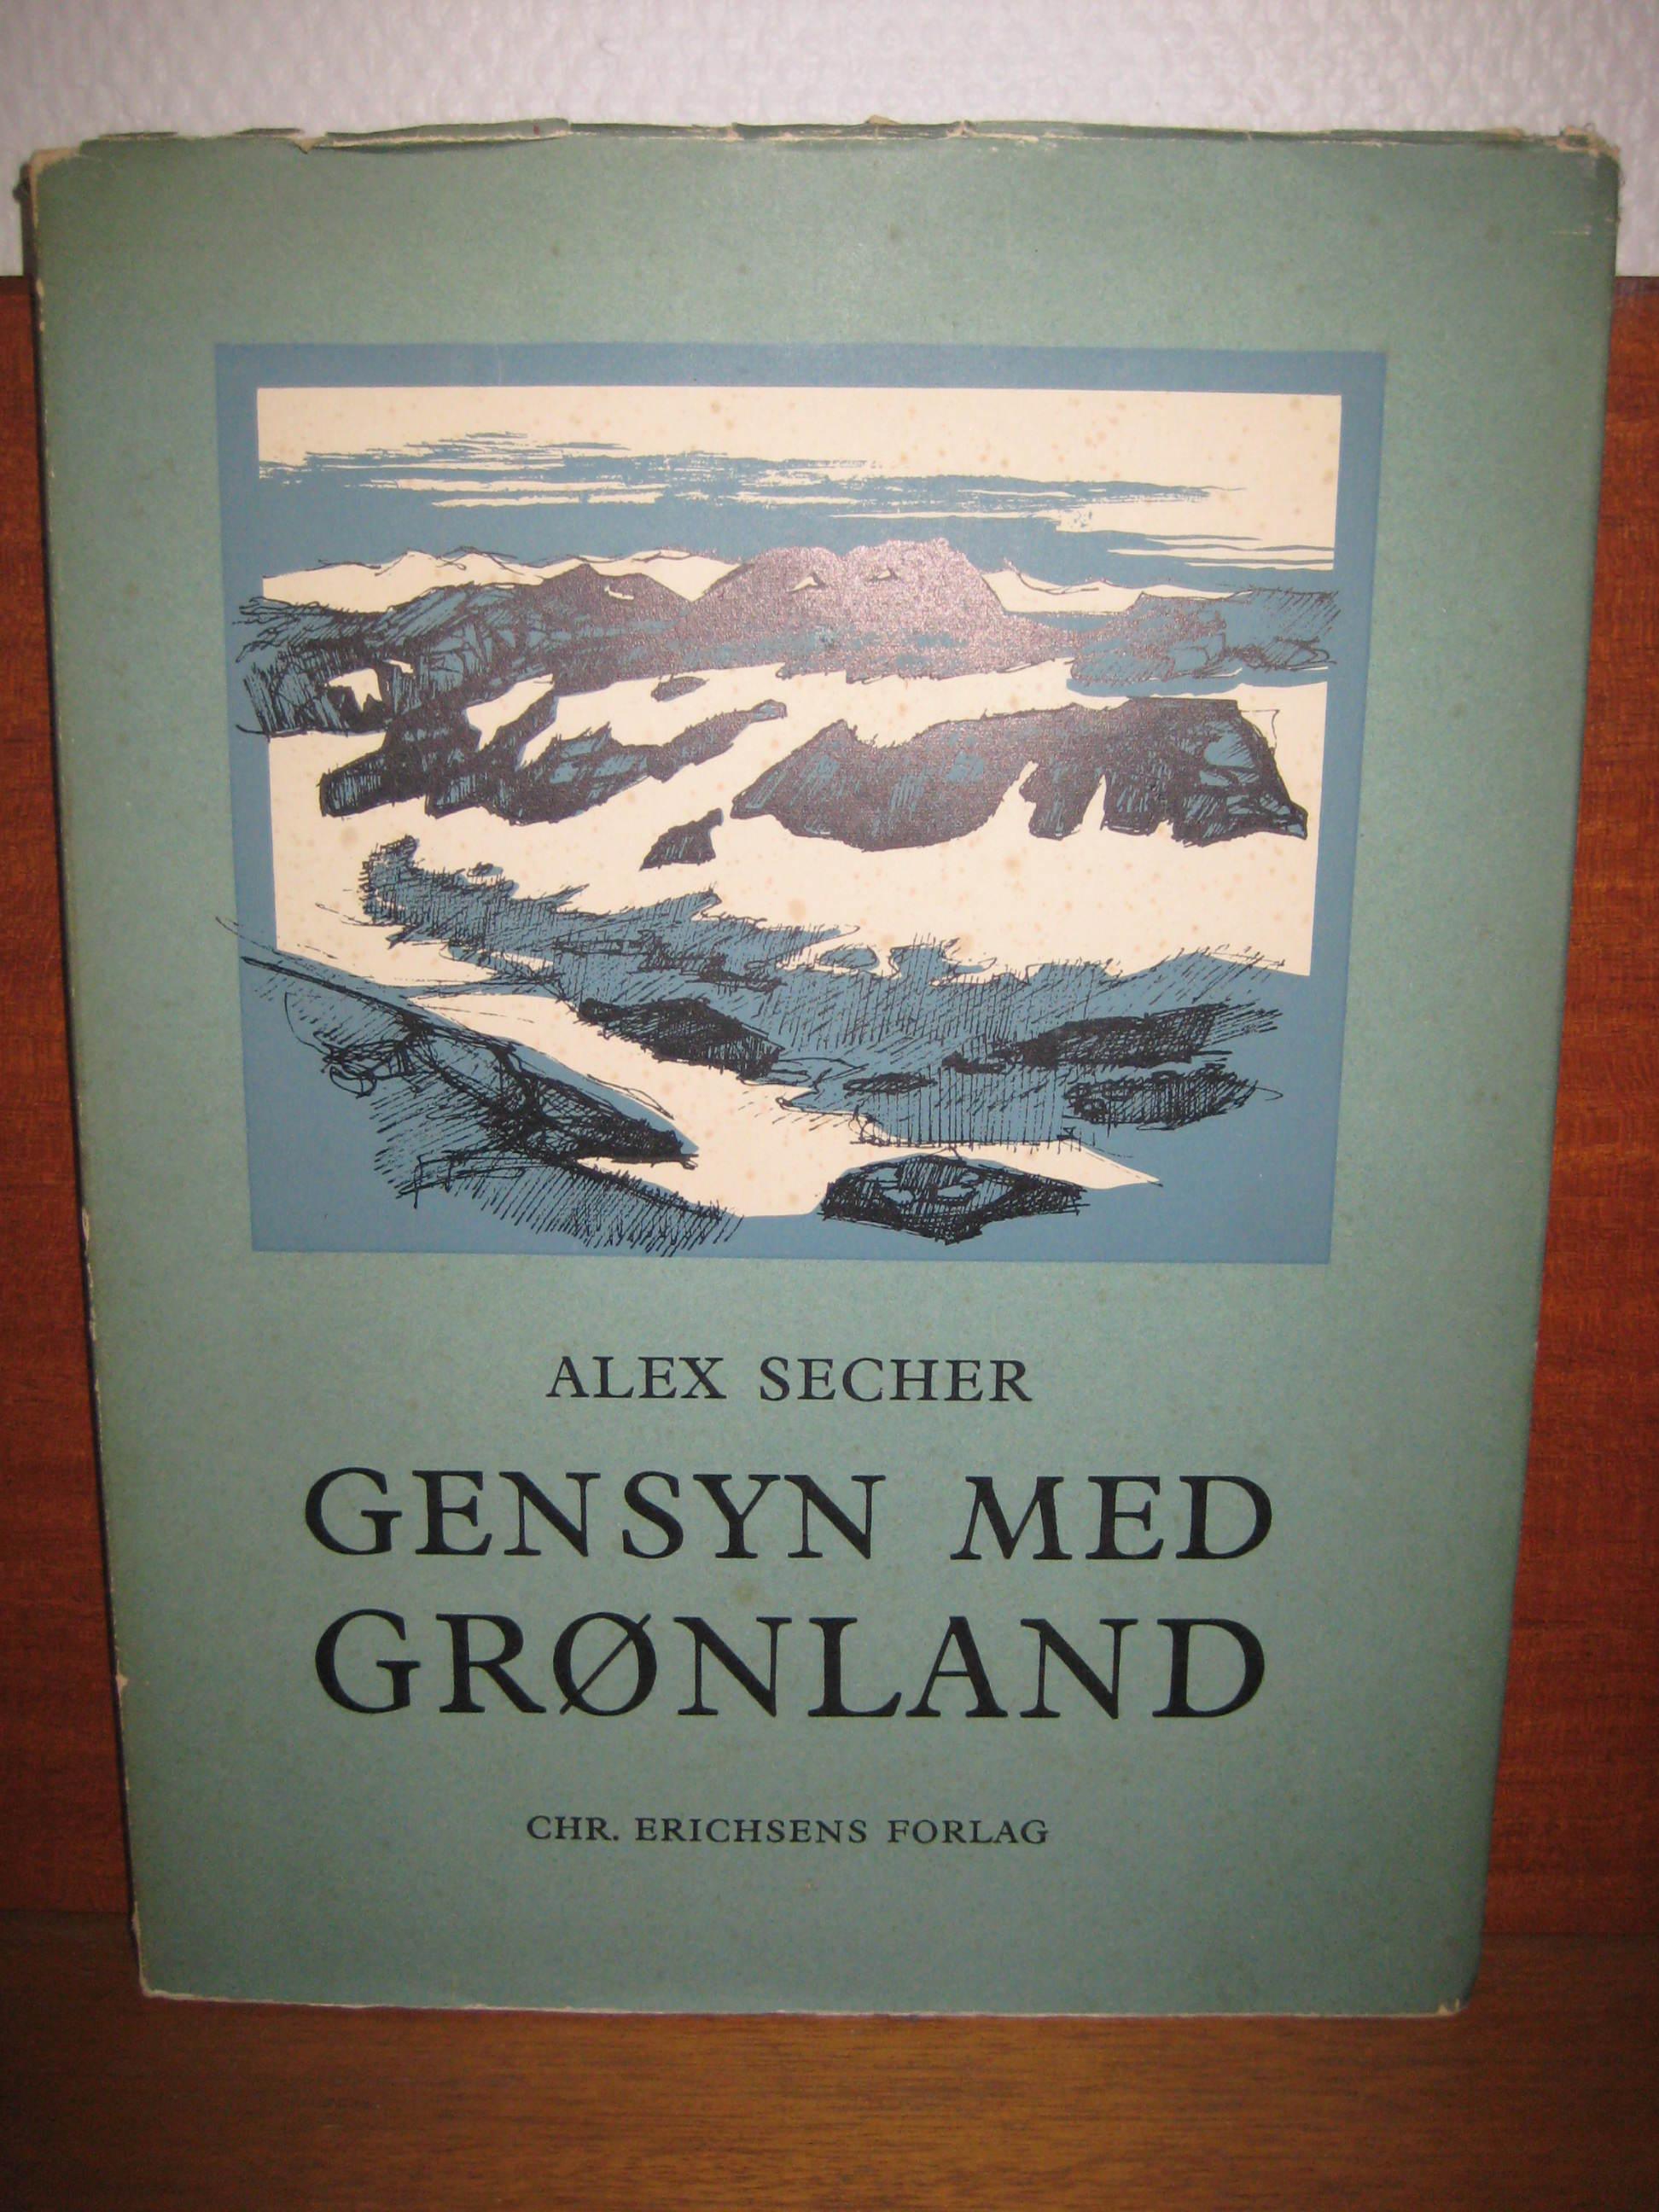 Gensyn med Grønland